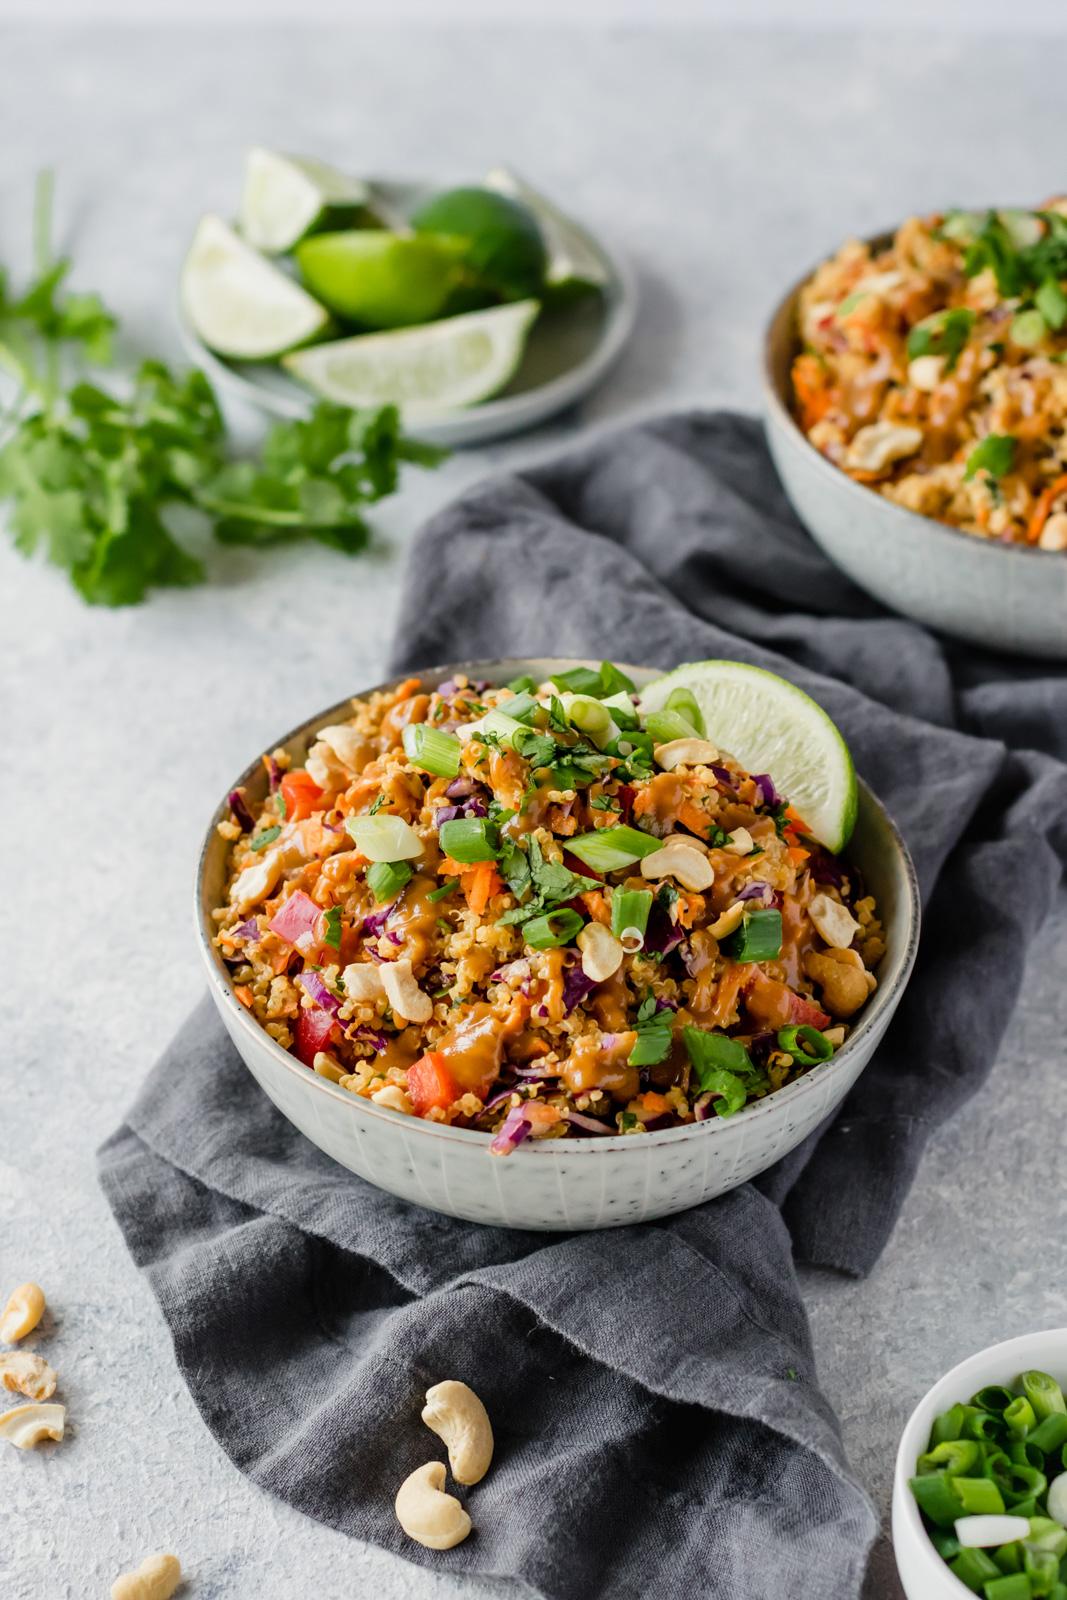 Famous Crunchy Cashew Thai Quinoa Salad #salad #parmesan #vegetarian #crunchy #quinoa